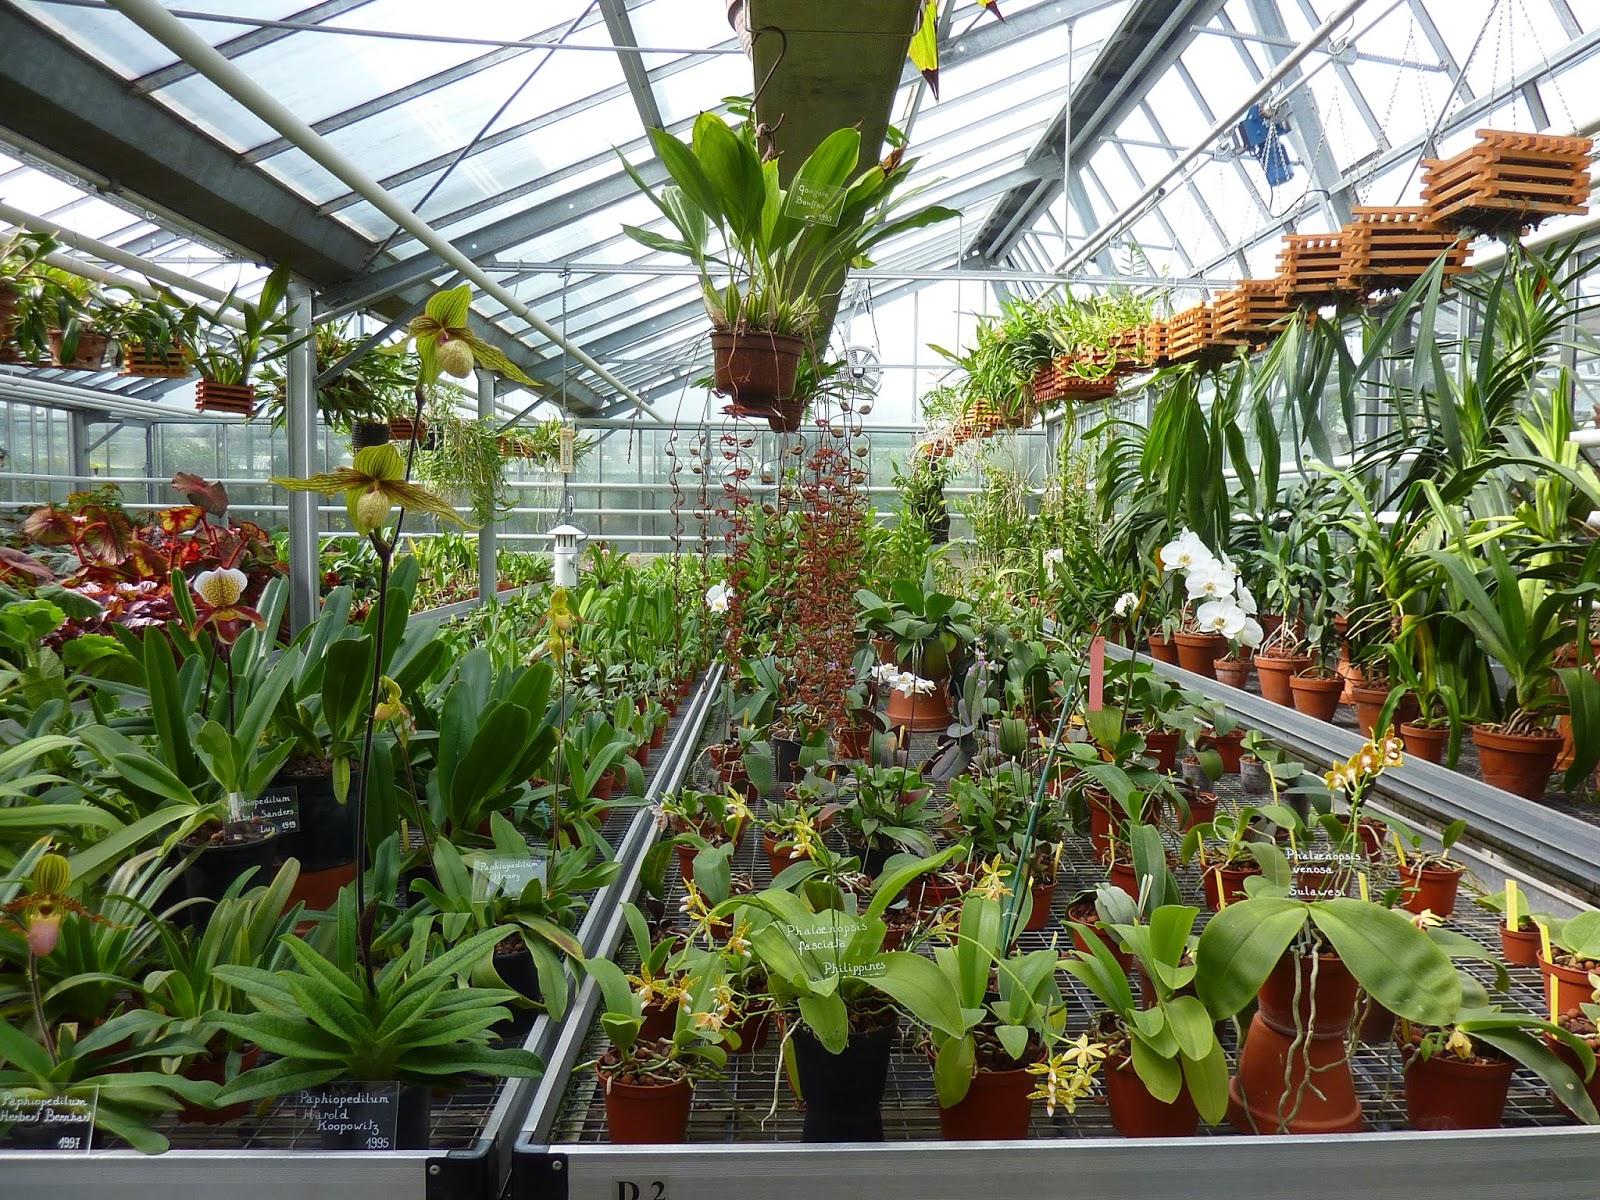 Invernaderos de jardin baratos dise os arquitect nicos - Jardines economicos ...